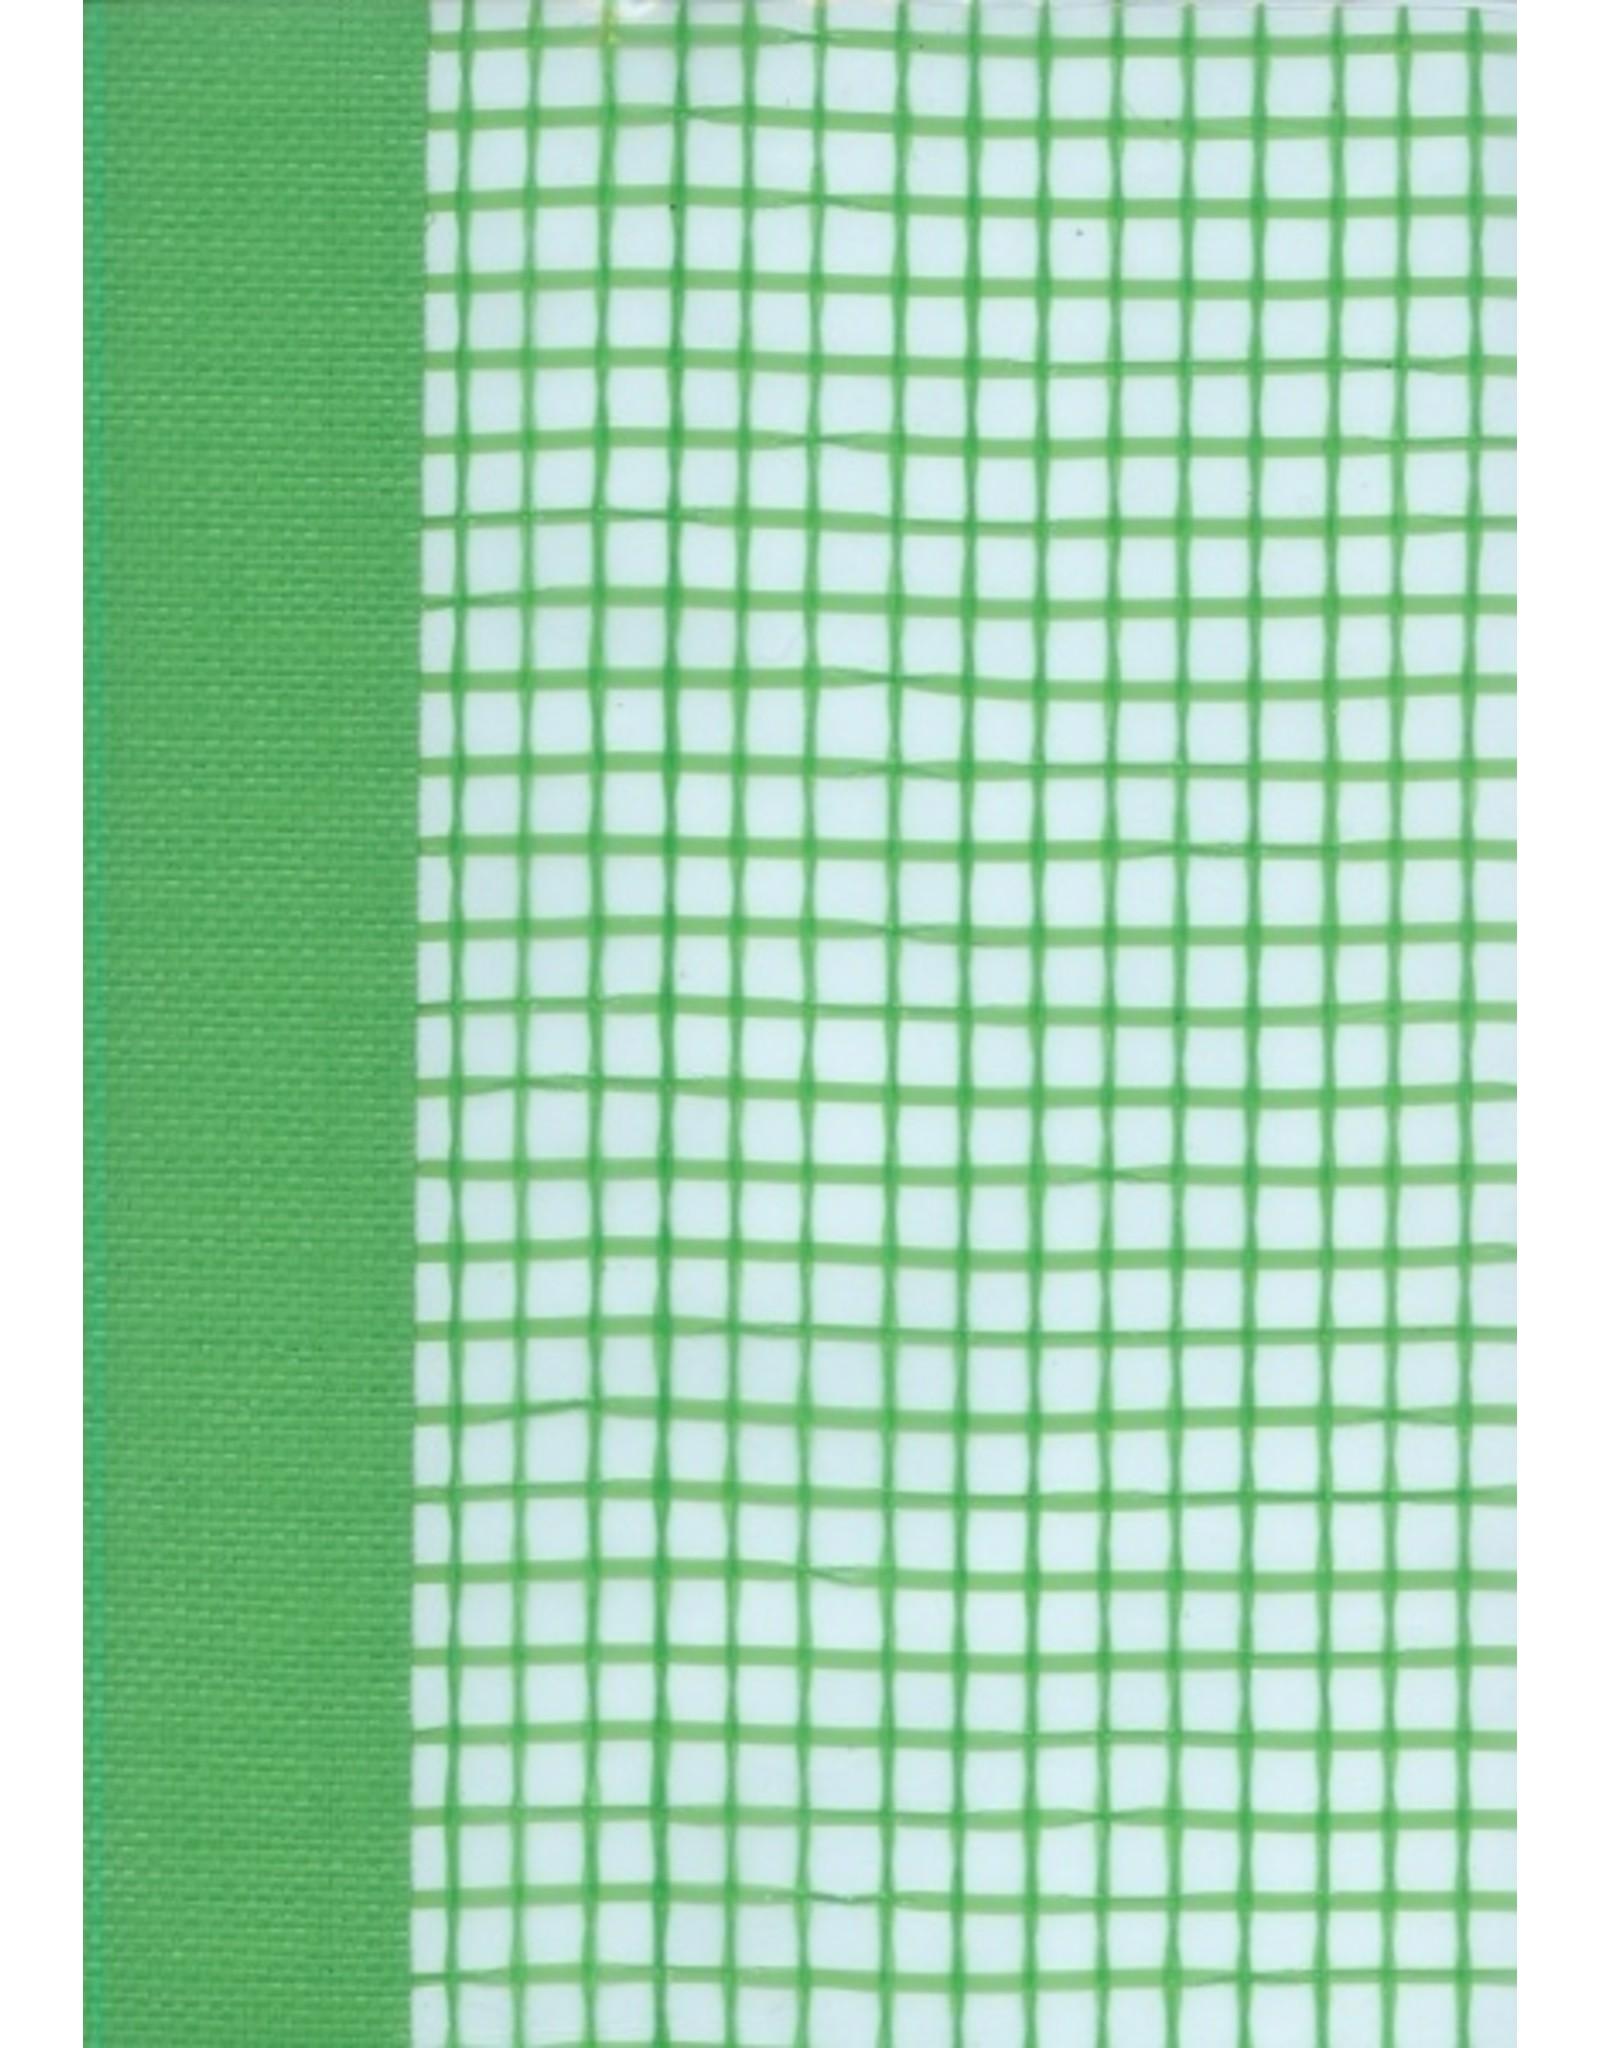 Overige Plastic gewapend groen 1.5m br. - 1 Meter